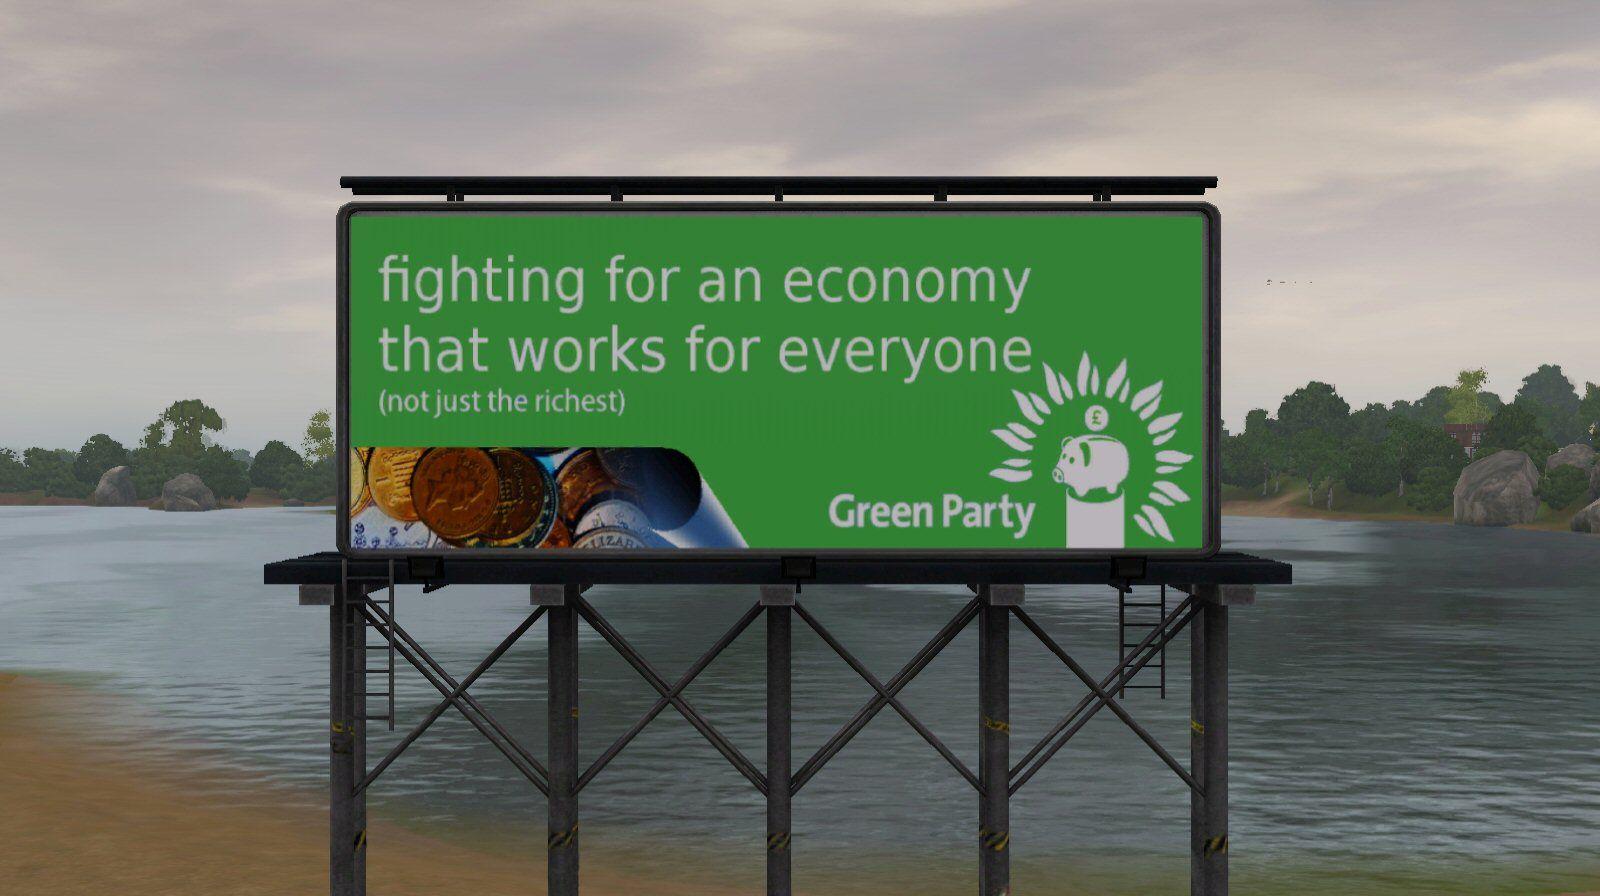 green-party-billboard.jpg (1600×896)